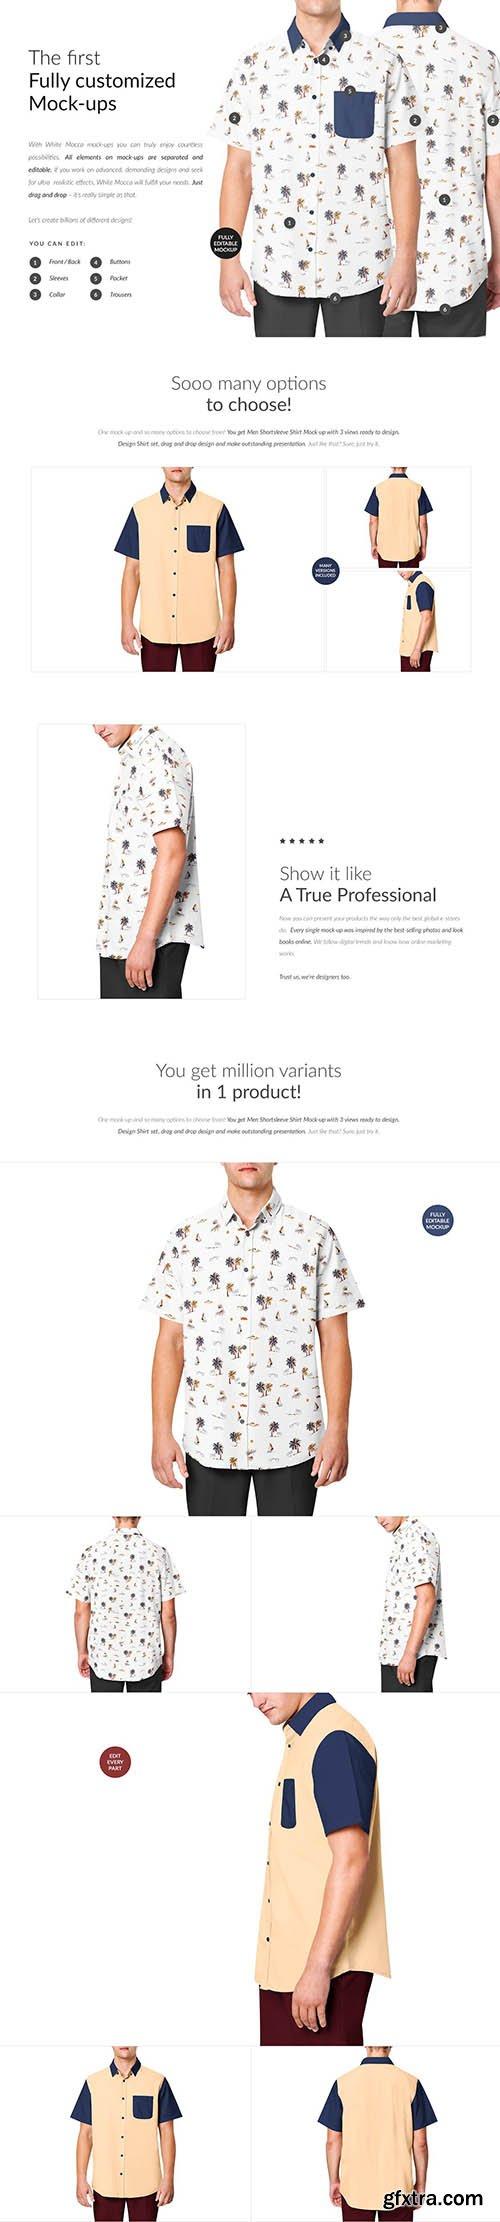 CreativeMarket - Men Shortsleeve Shirt Mock-ups 6411955